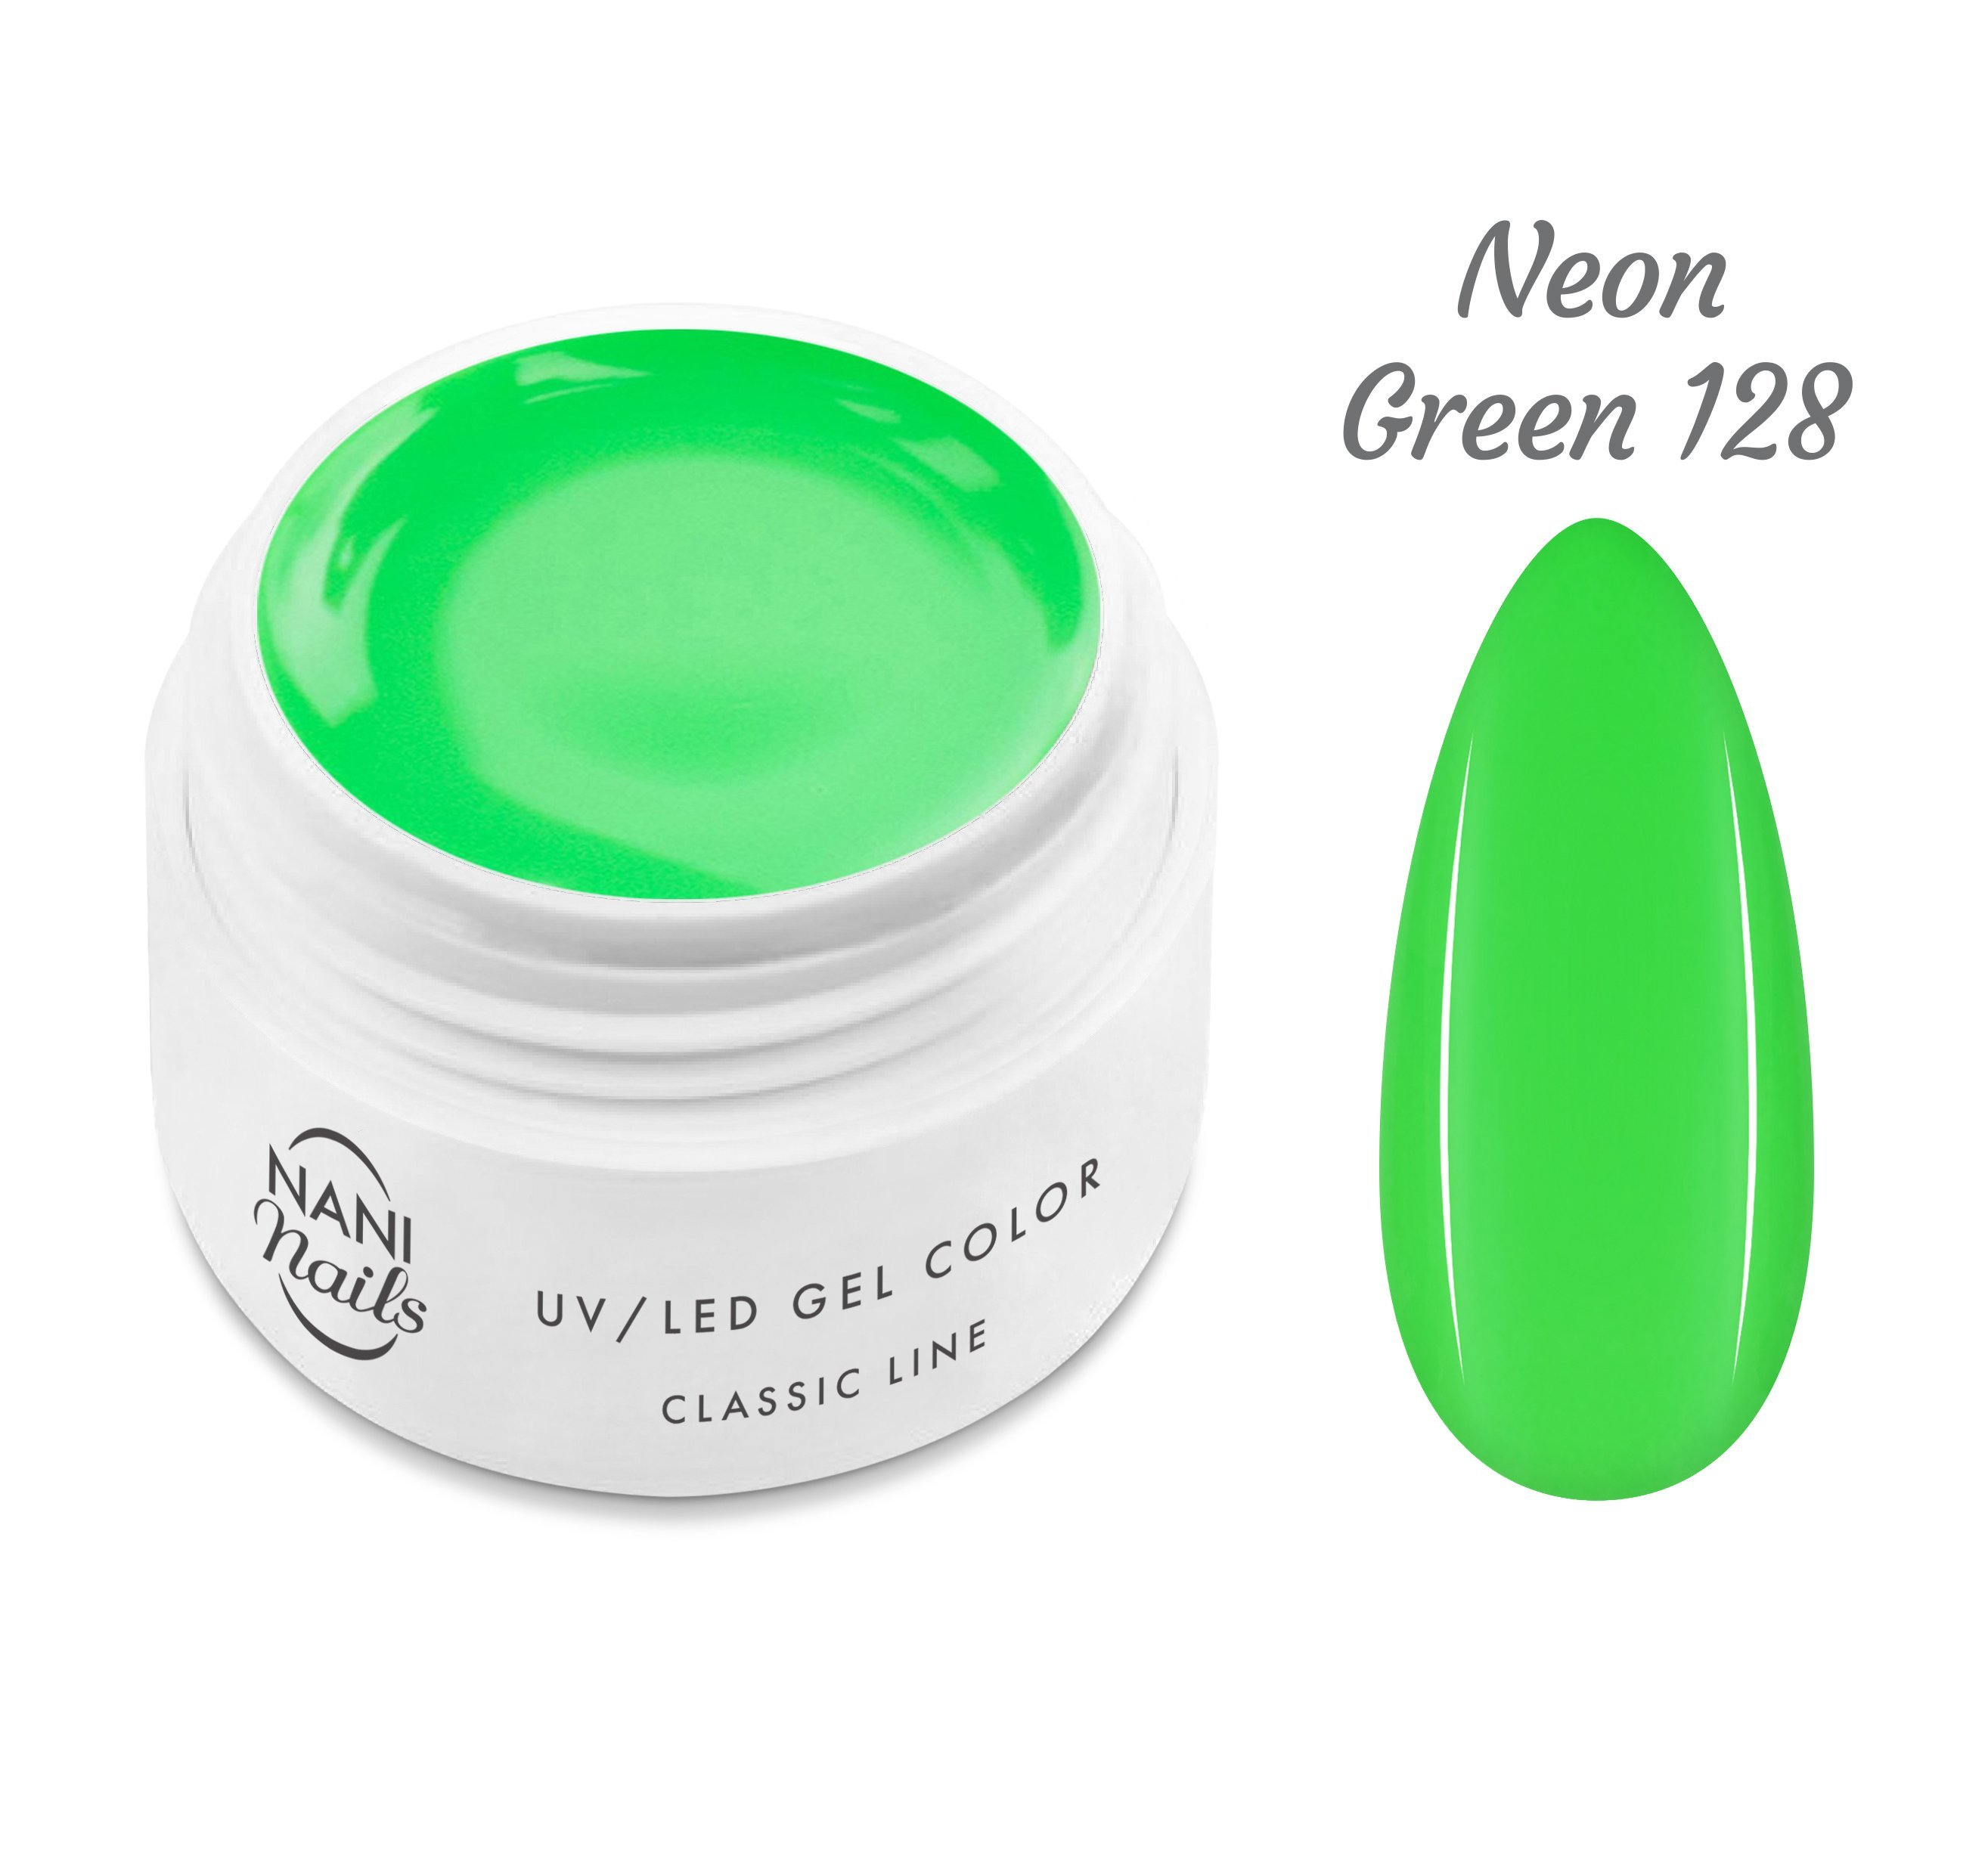 NANI UV gél Classic Neon Line 5 ml - Neon Green